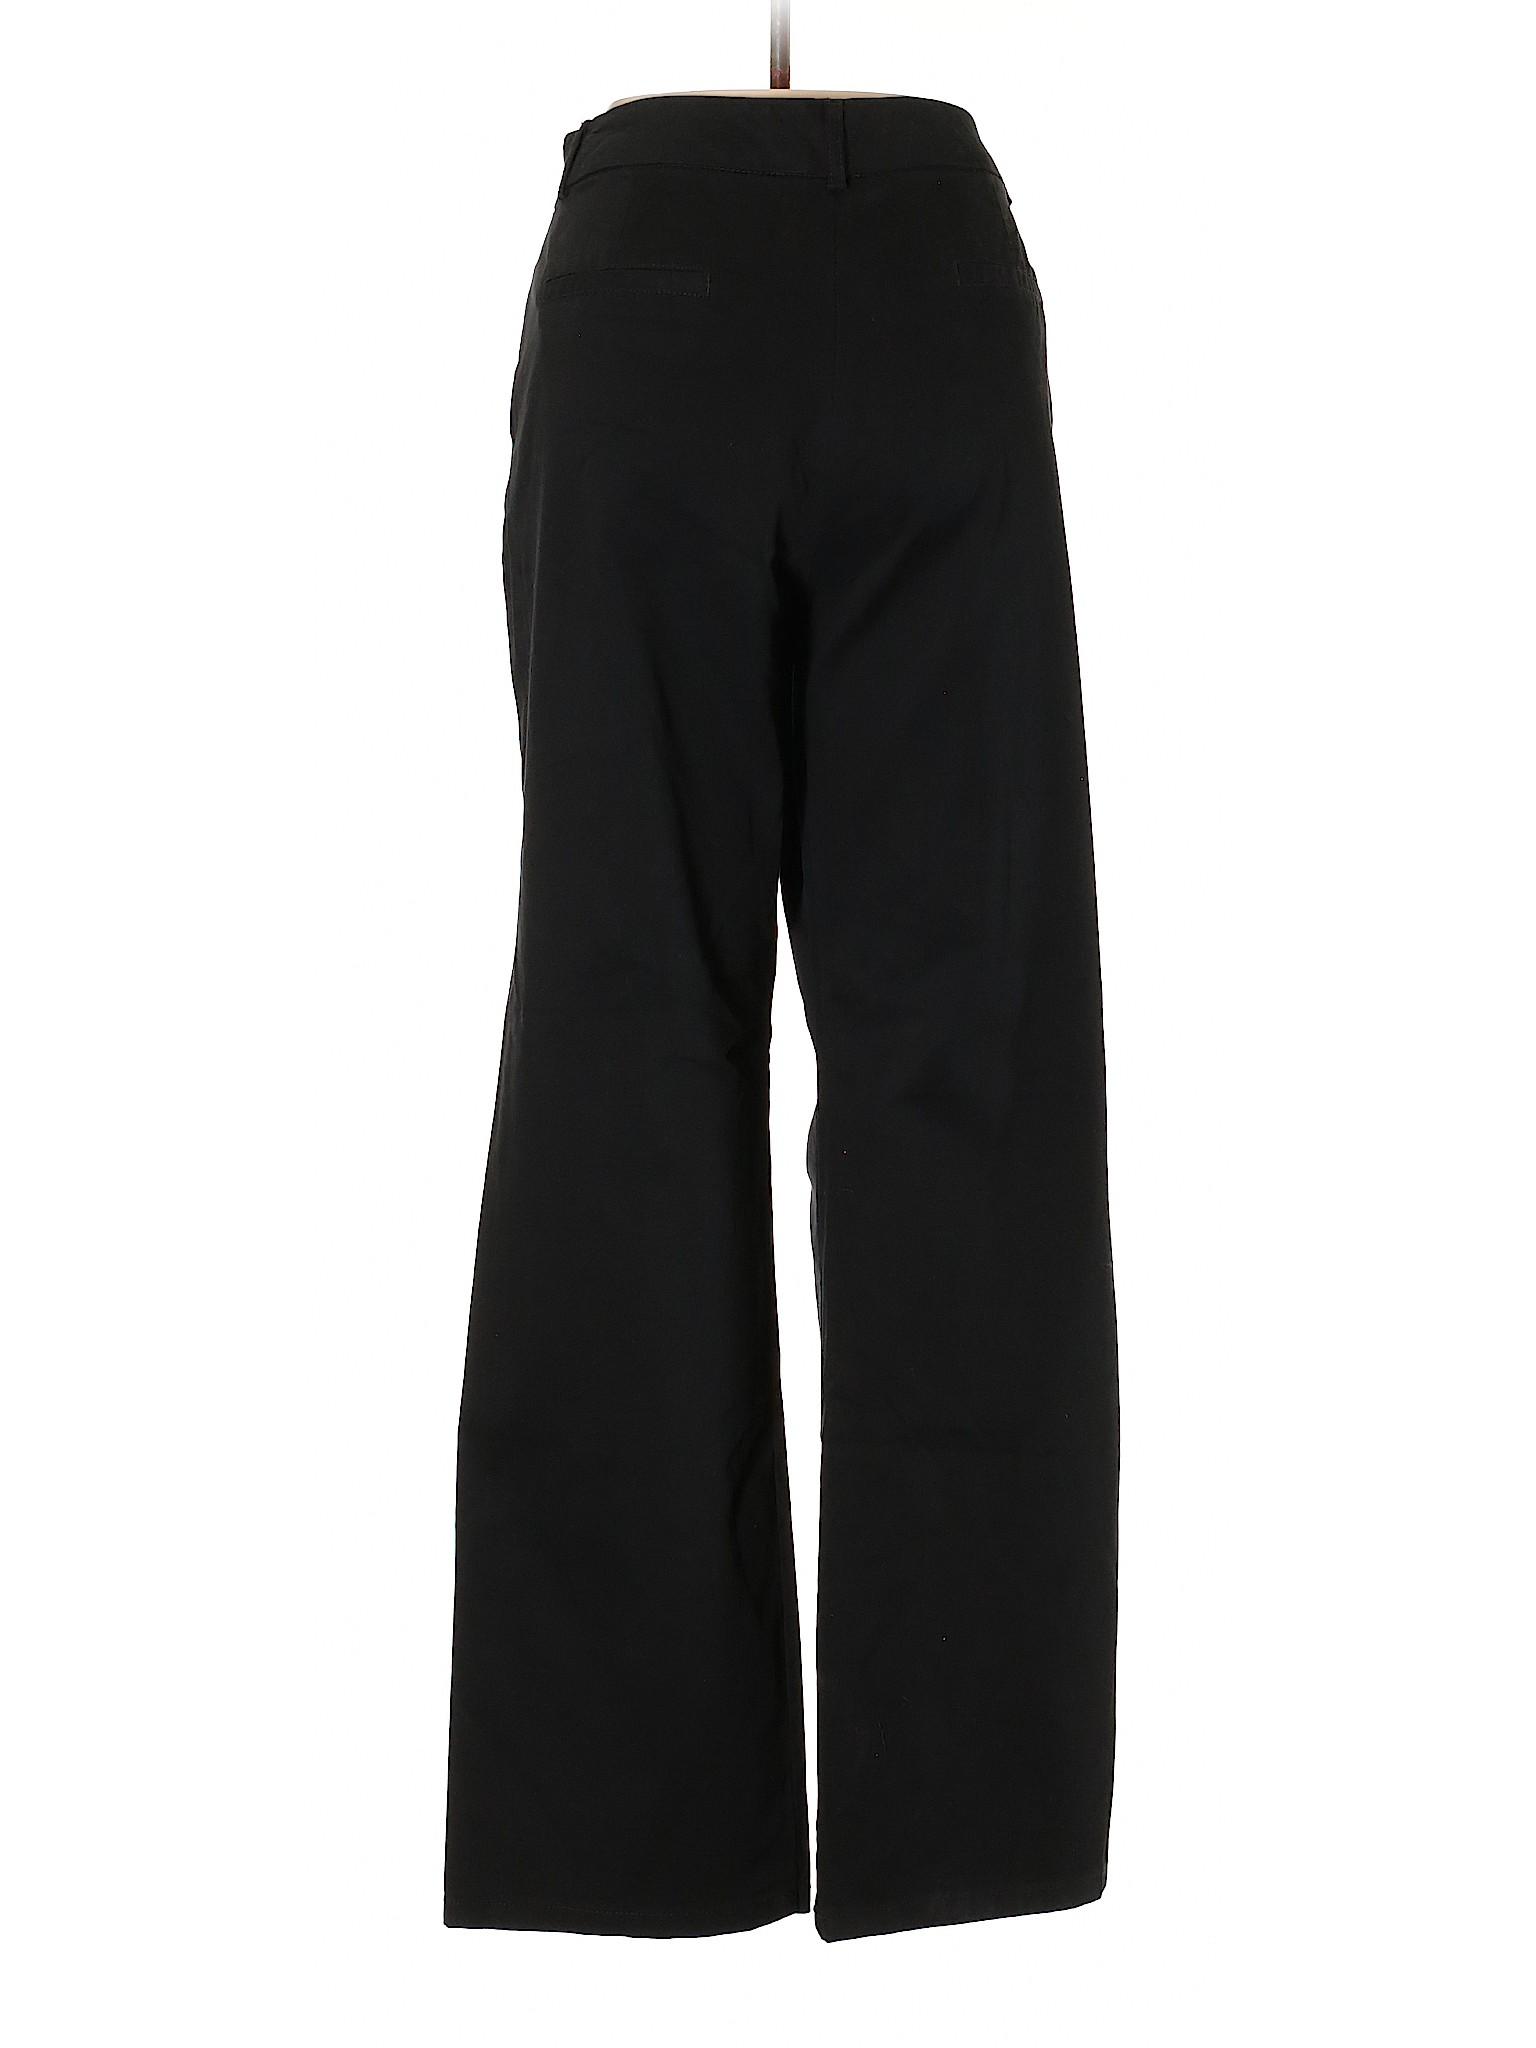 Pants winter Boutique Boutique Bandolino Casual winter E6qwXxz6